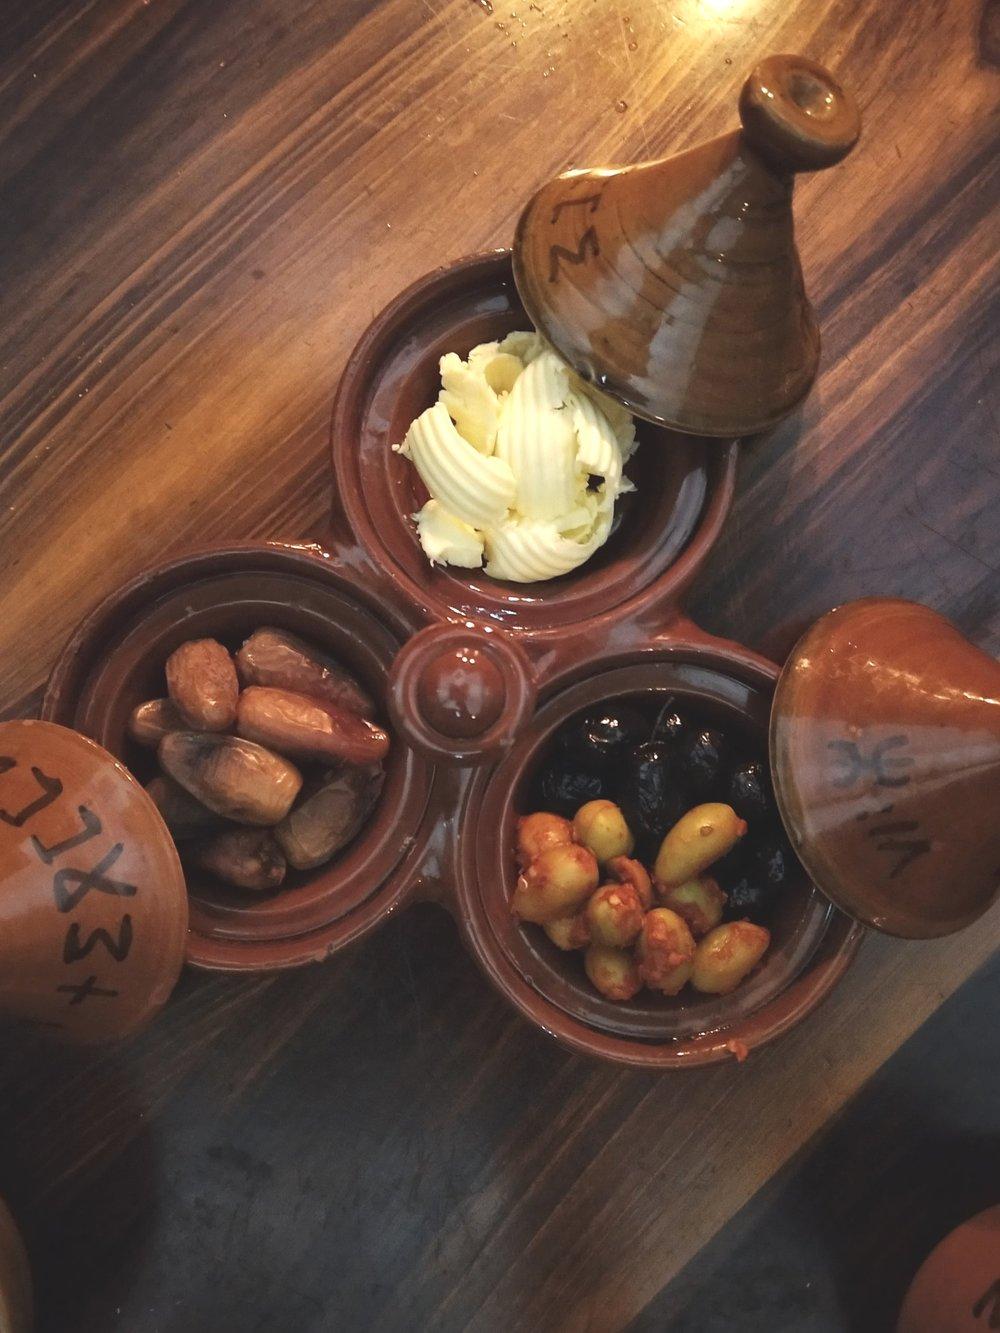 Breakfast at Kasbah du toubkal